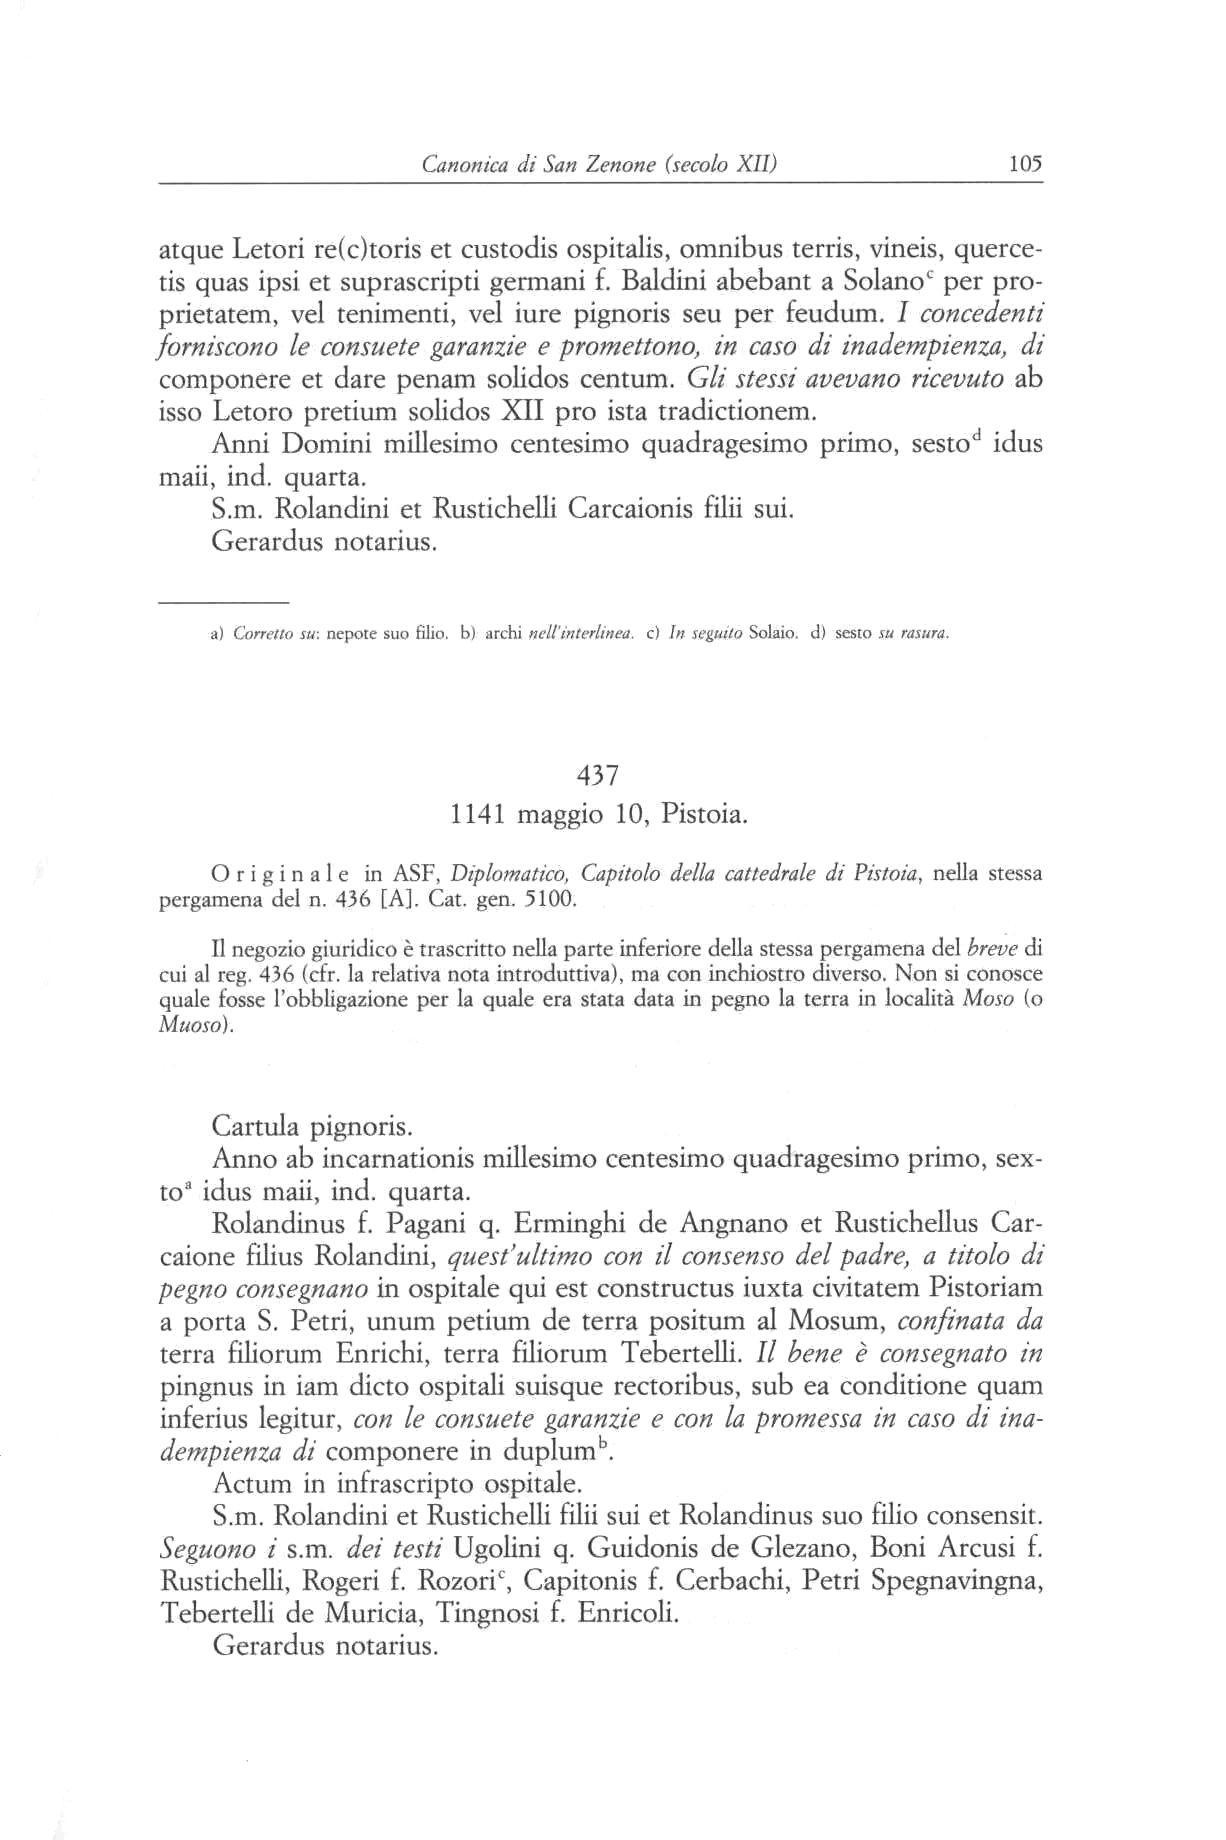 Canonica S. Zenone XII 0105.jpg